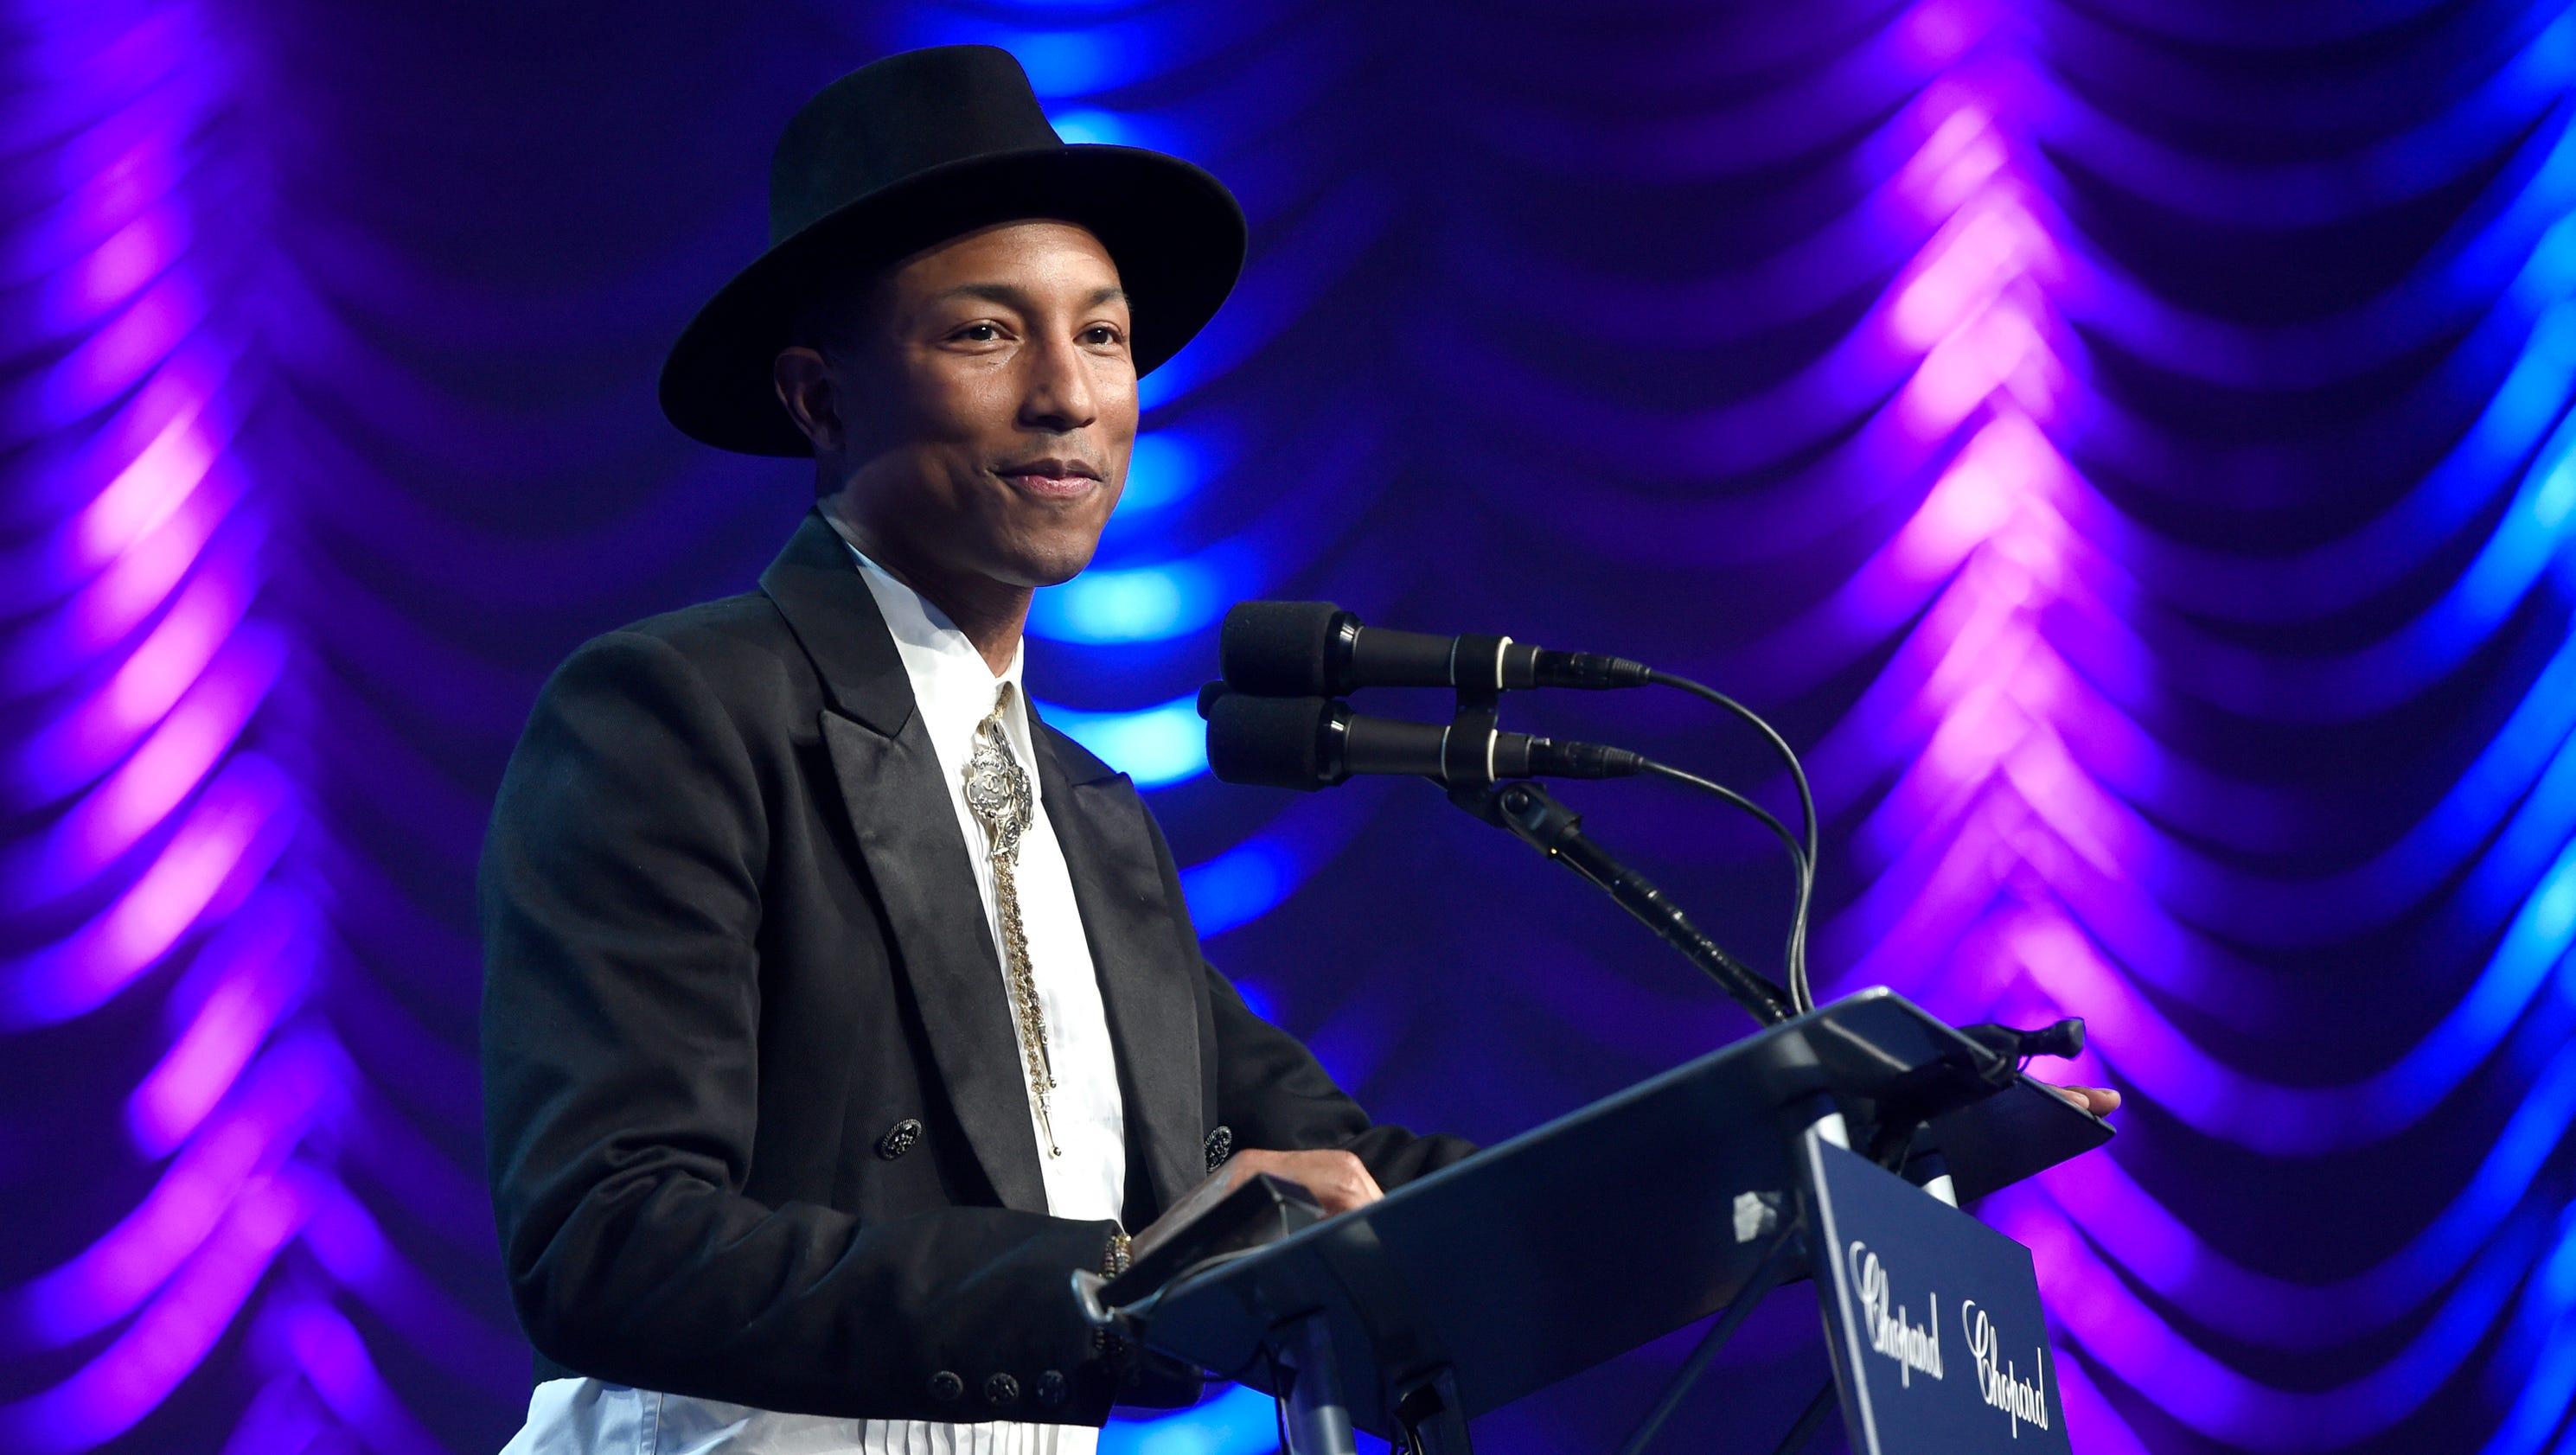 Pharrell ellen address kim burrell 39 s anti gay statements - Ellen show address ...